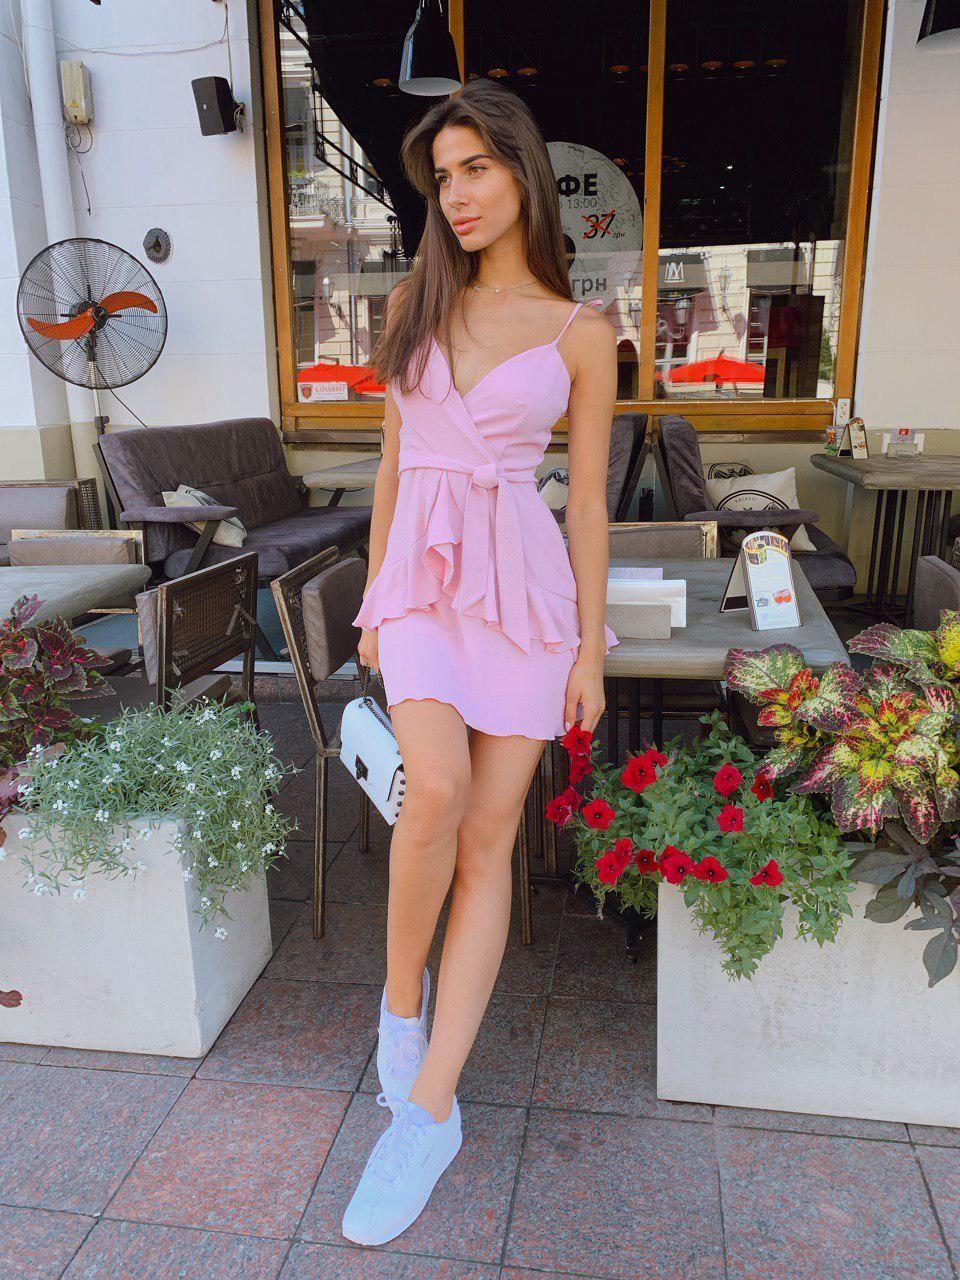 Яркое платье мини на лето - в расцветки